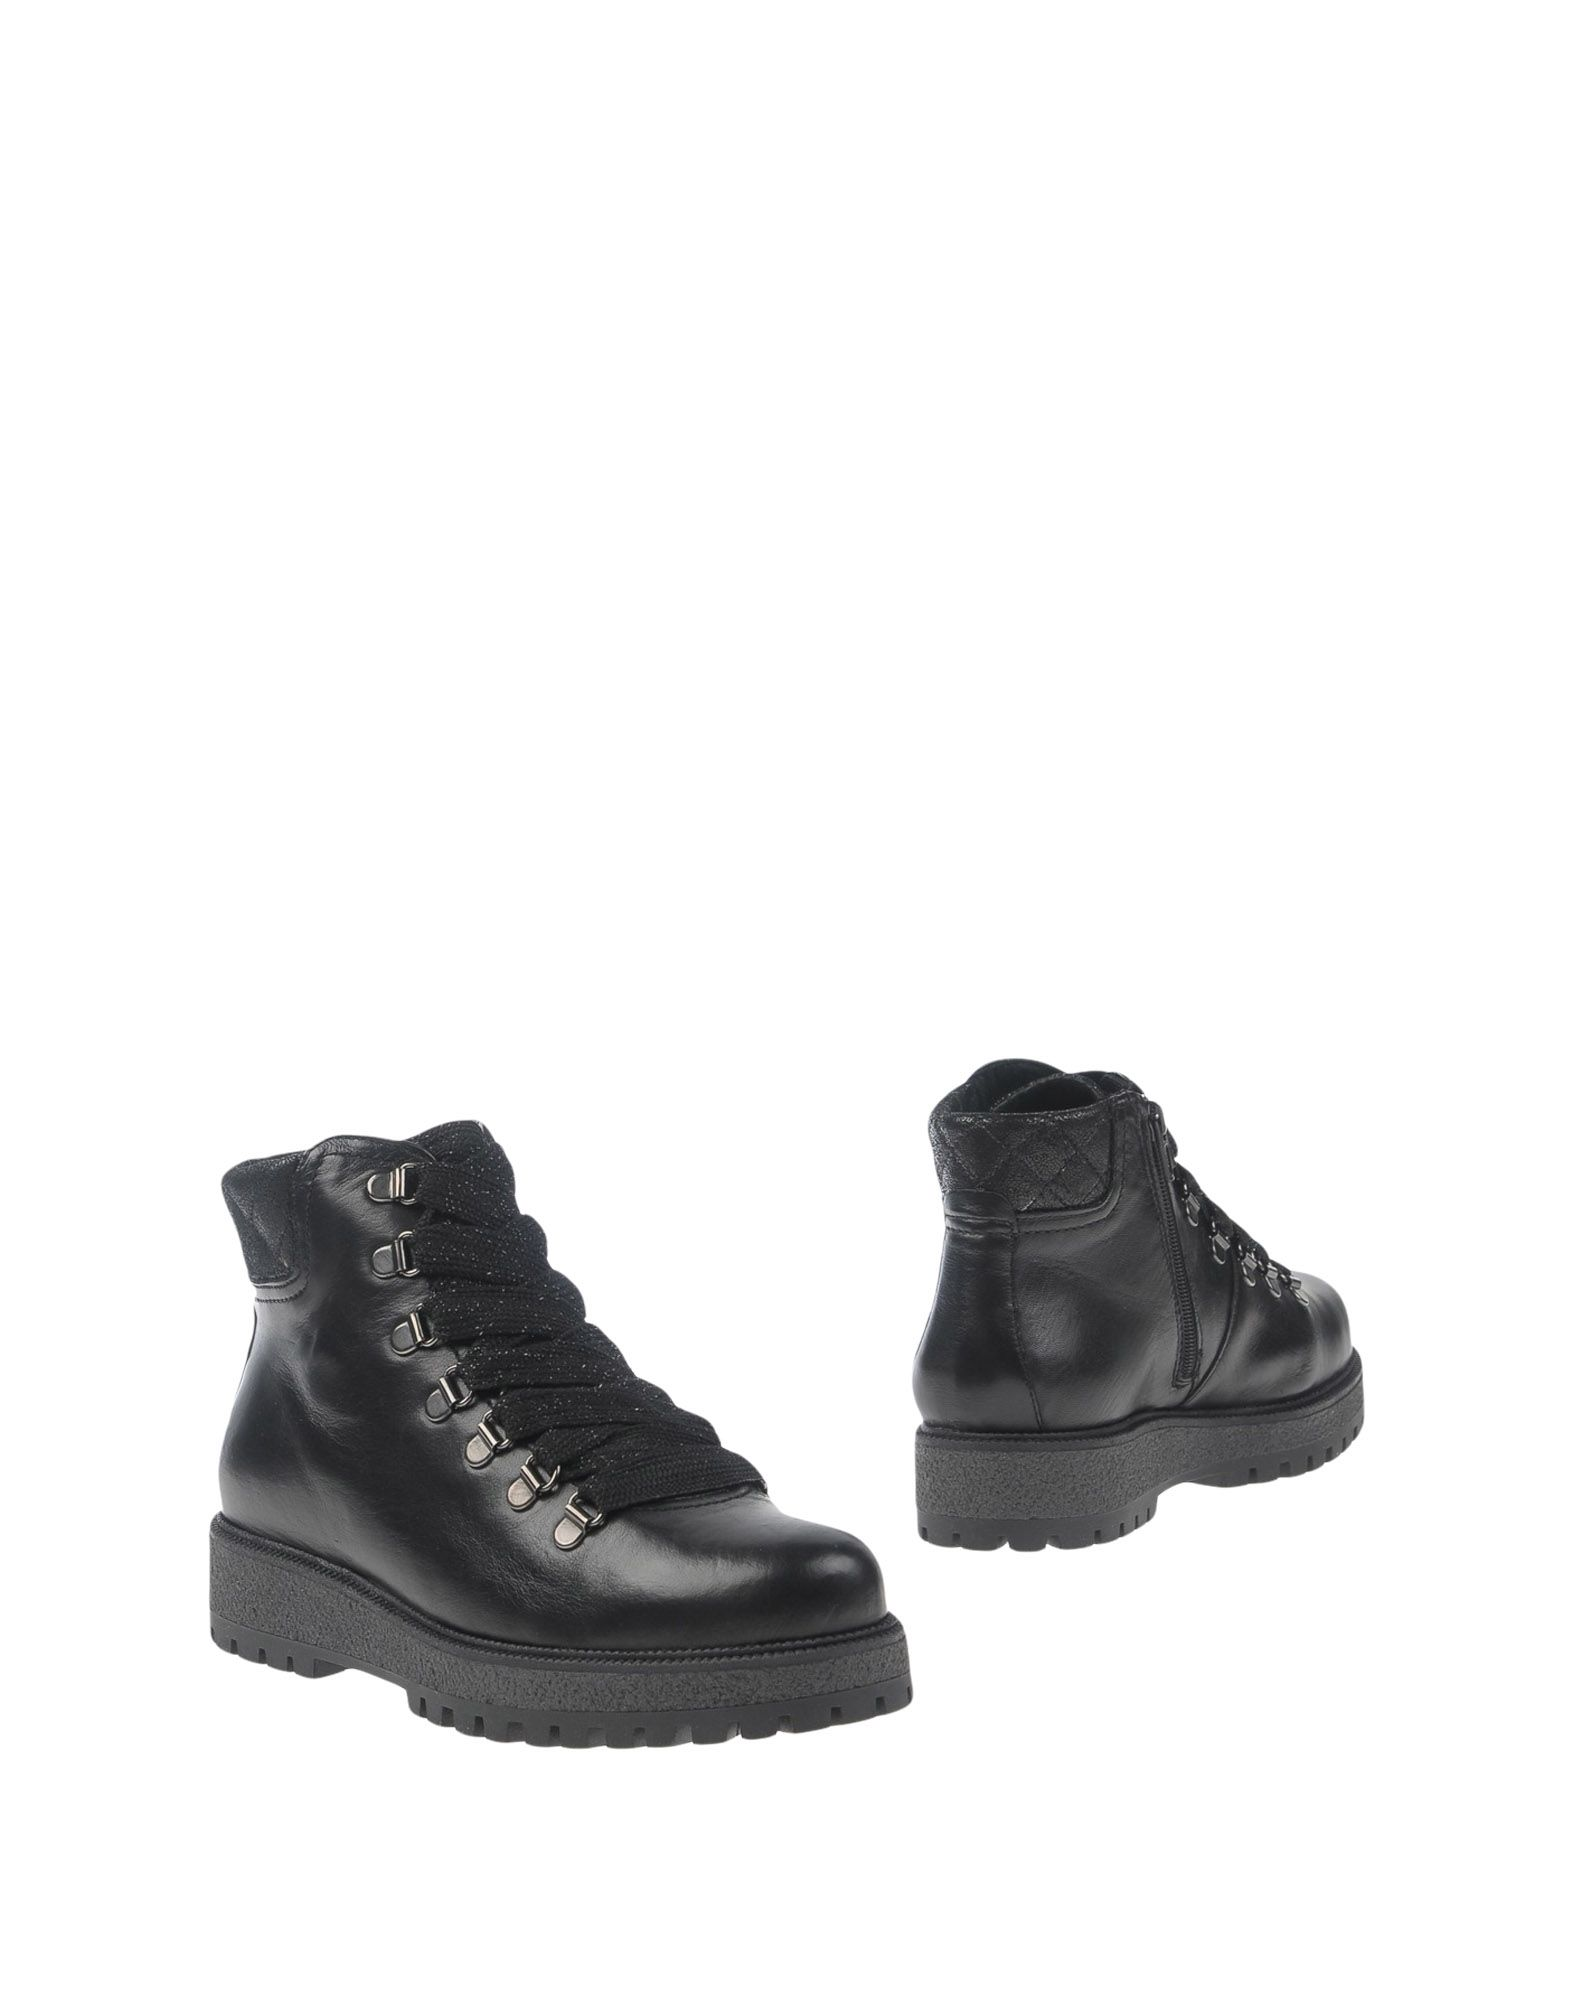 MANAS Полусапоги и высокие ботинки magazzini del sale полусапоги и высокие ботинки